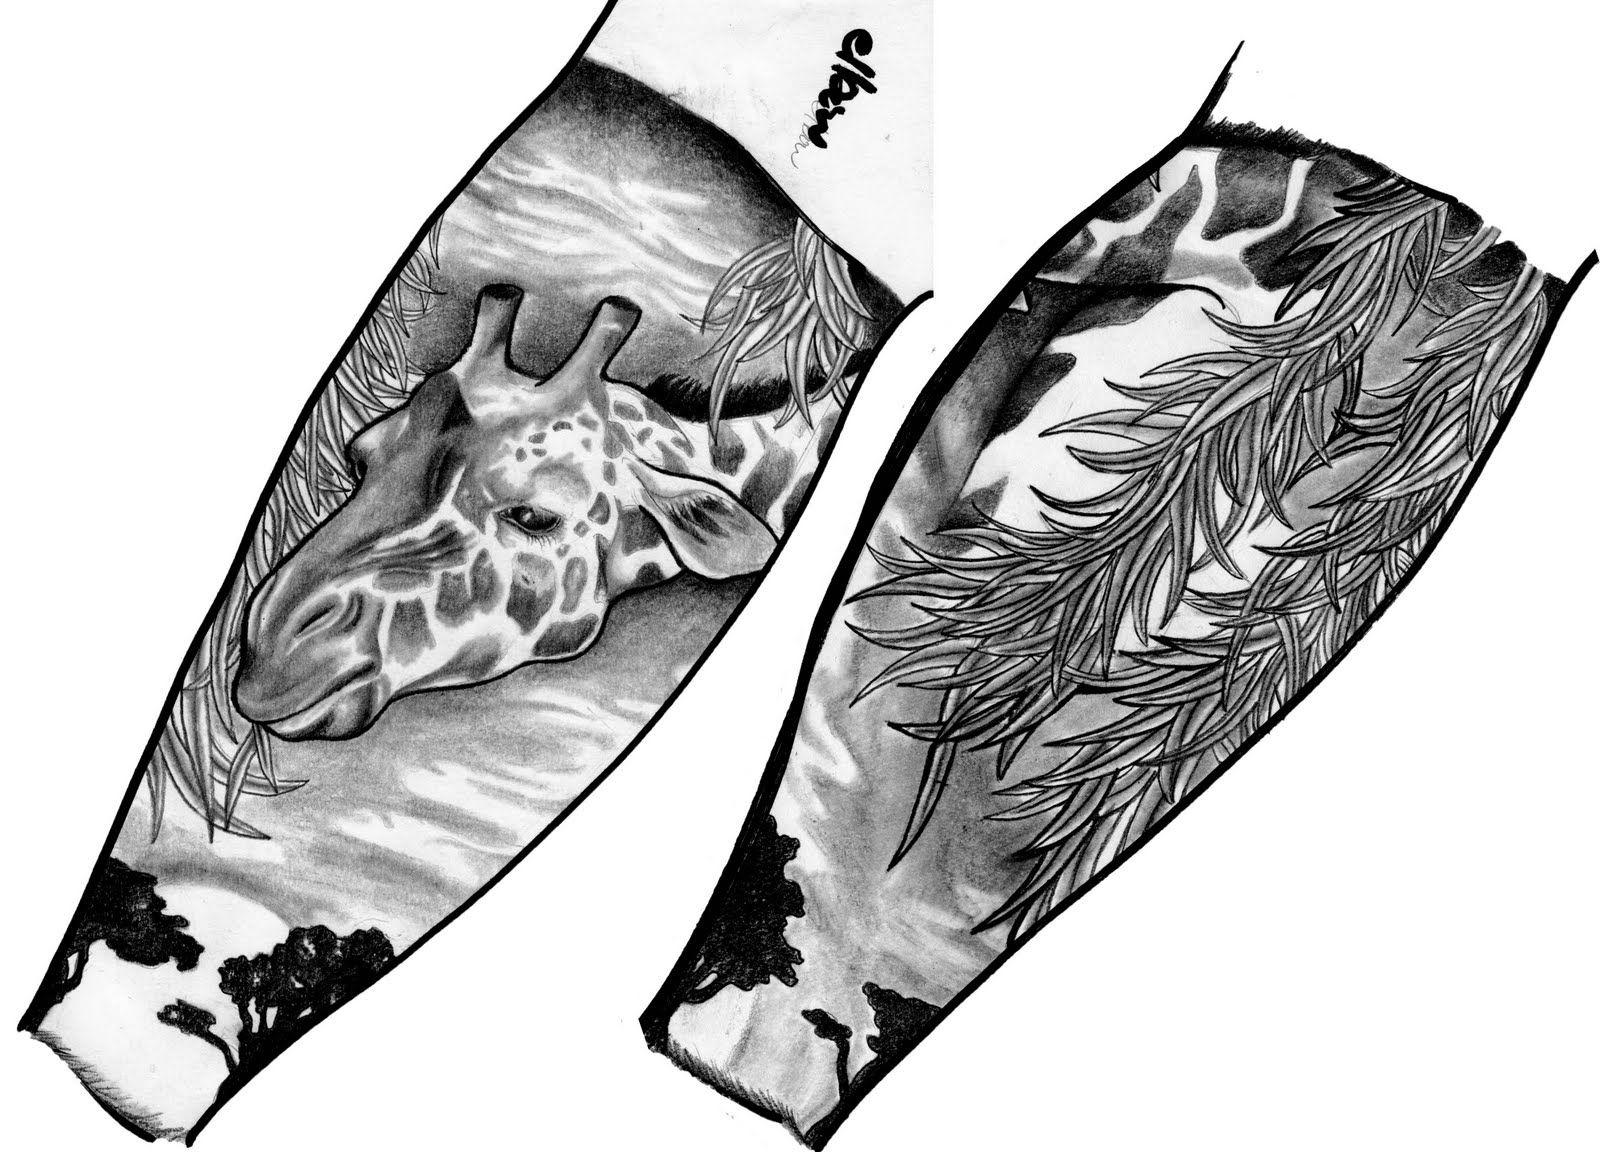 inner bicep tattoo paper template Recherche Google